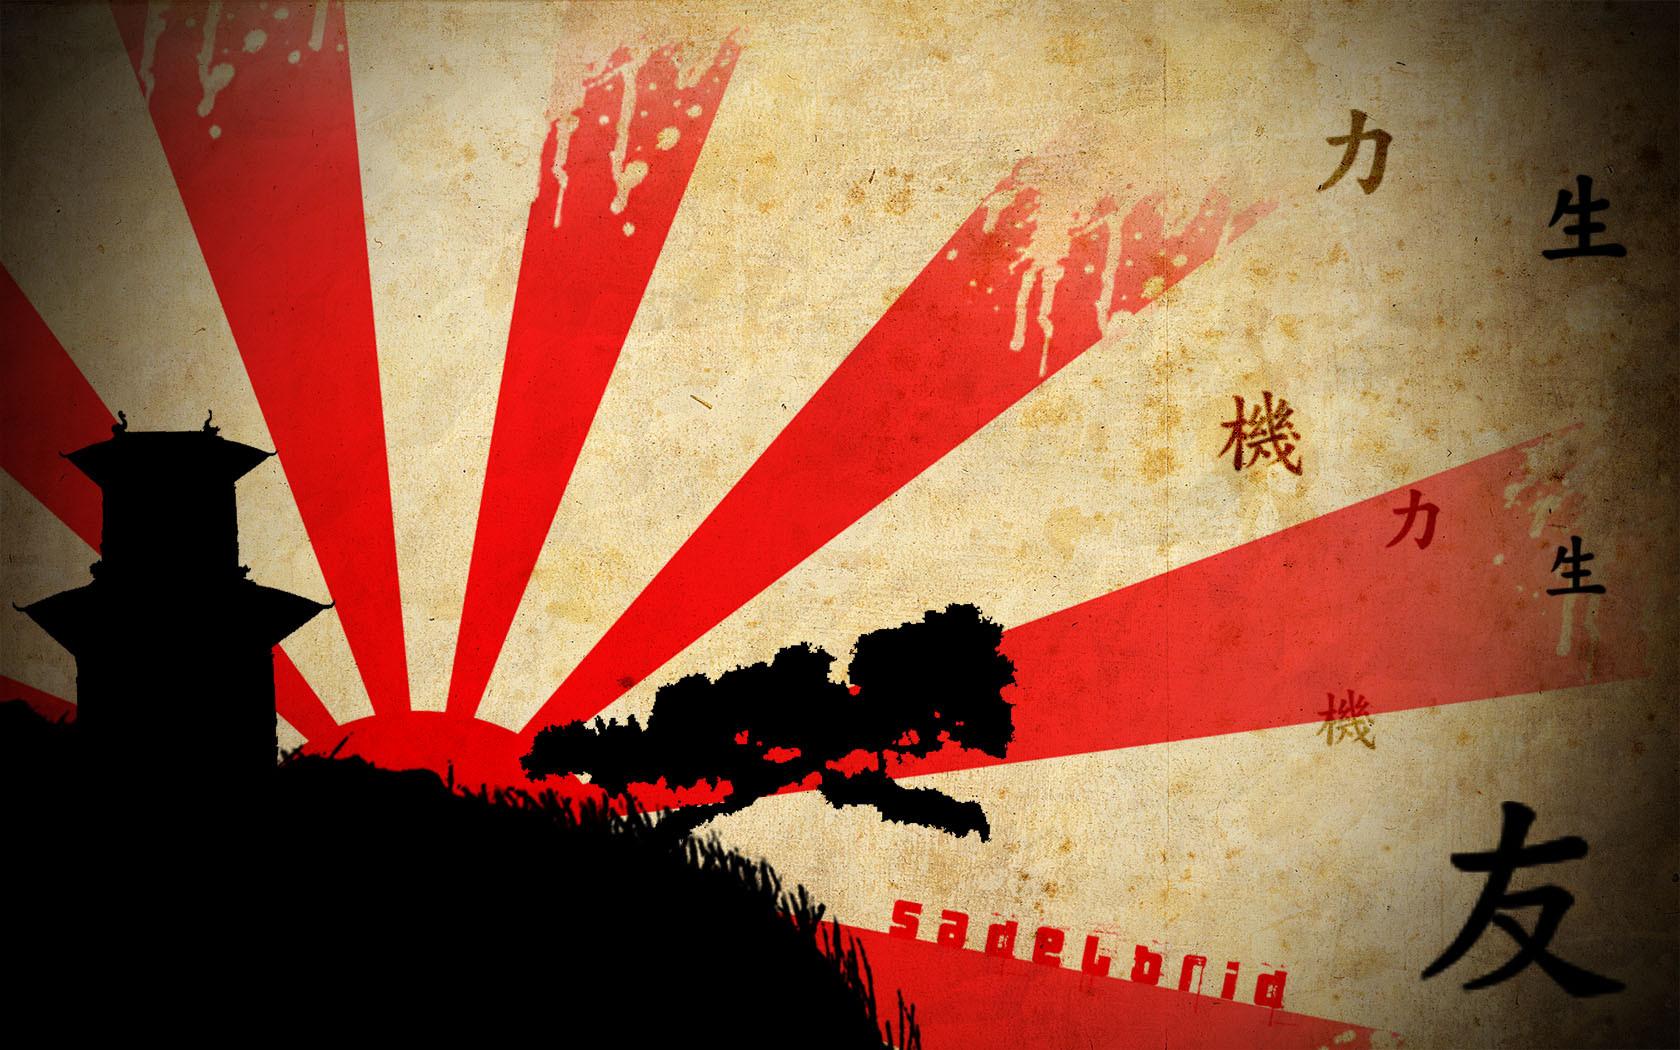 Mundo chino abstracto - 1680x1050